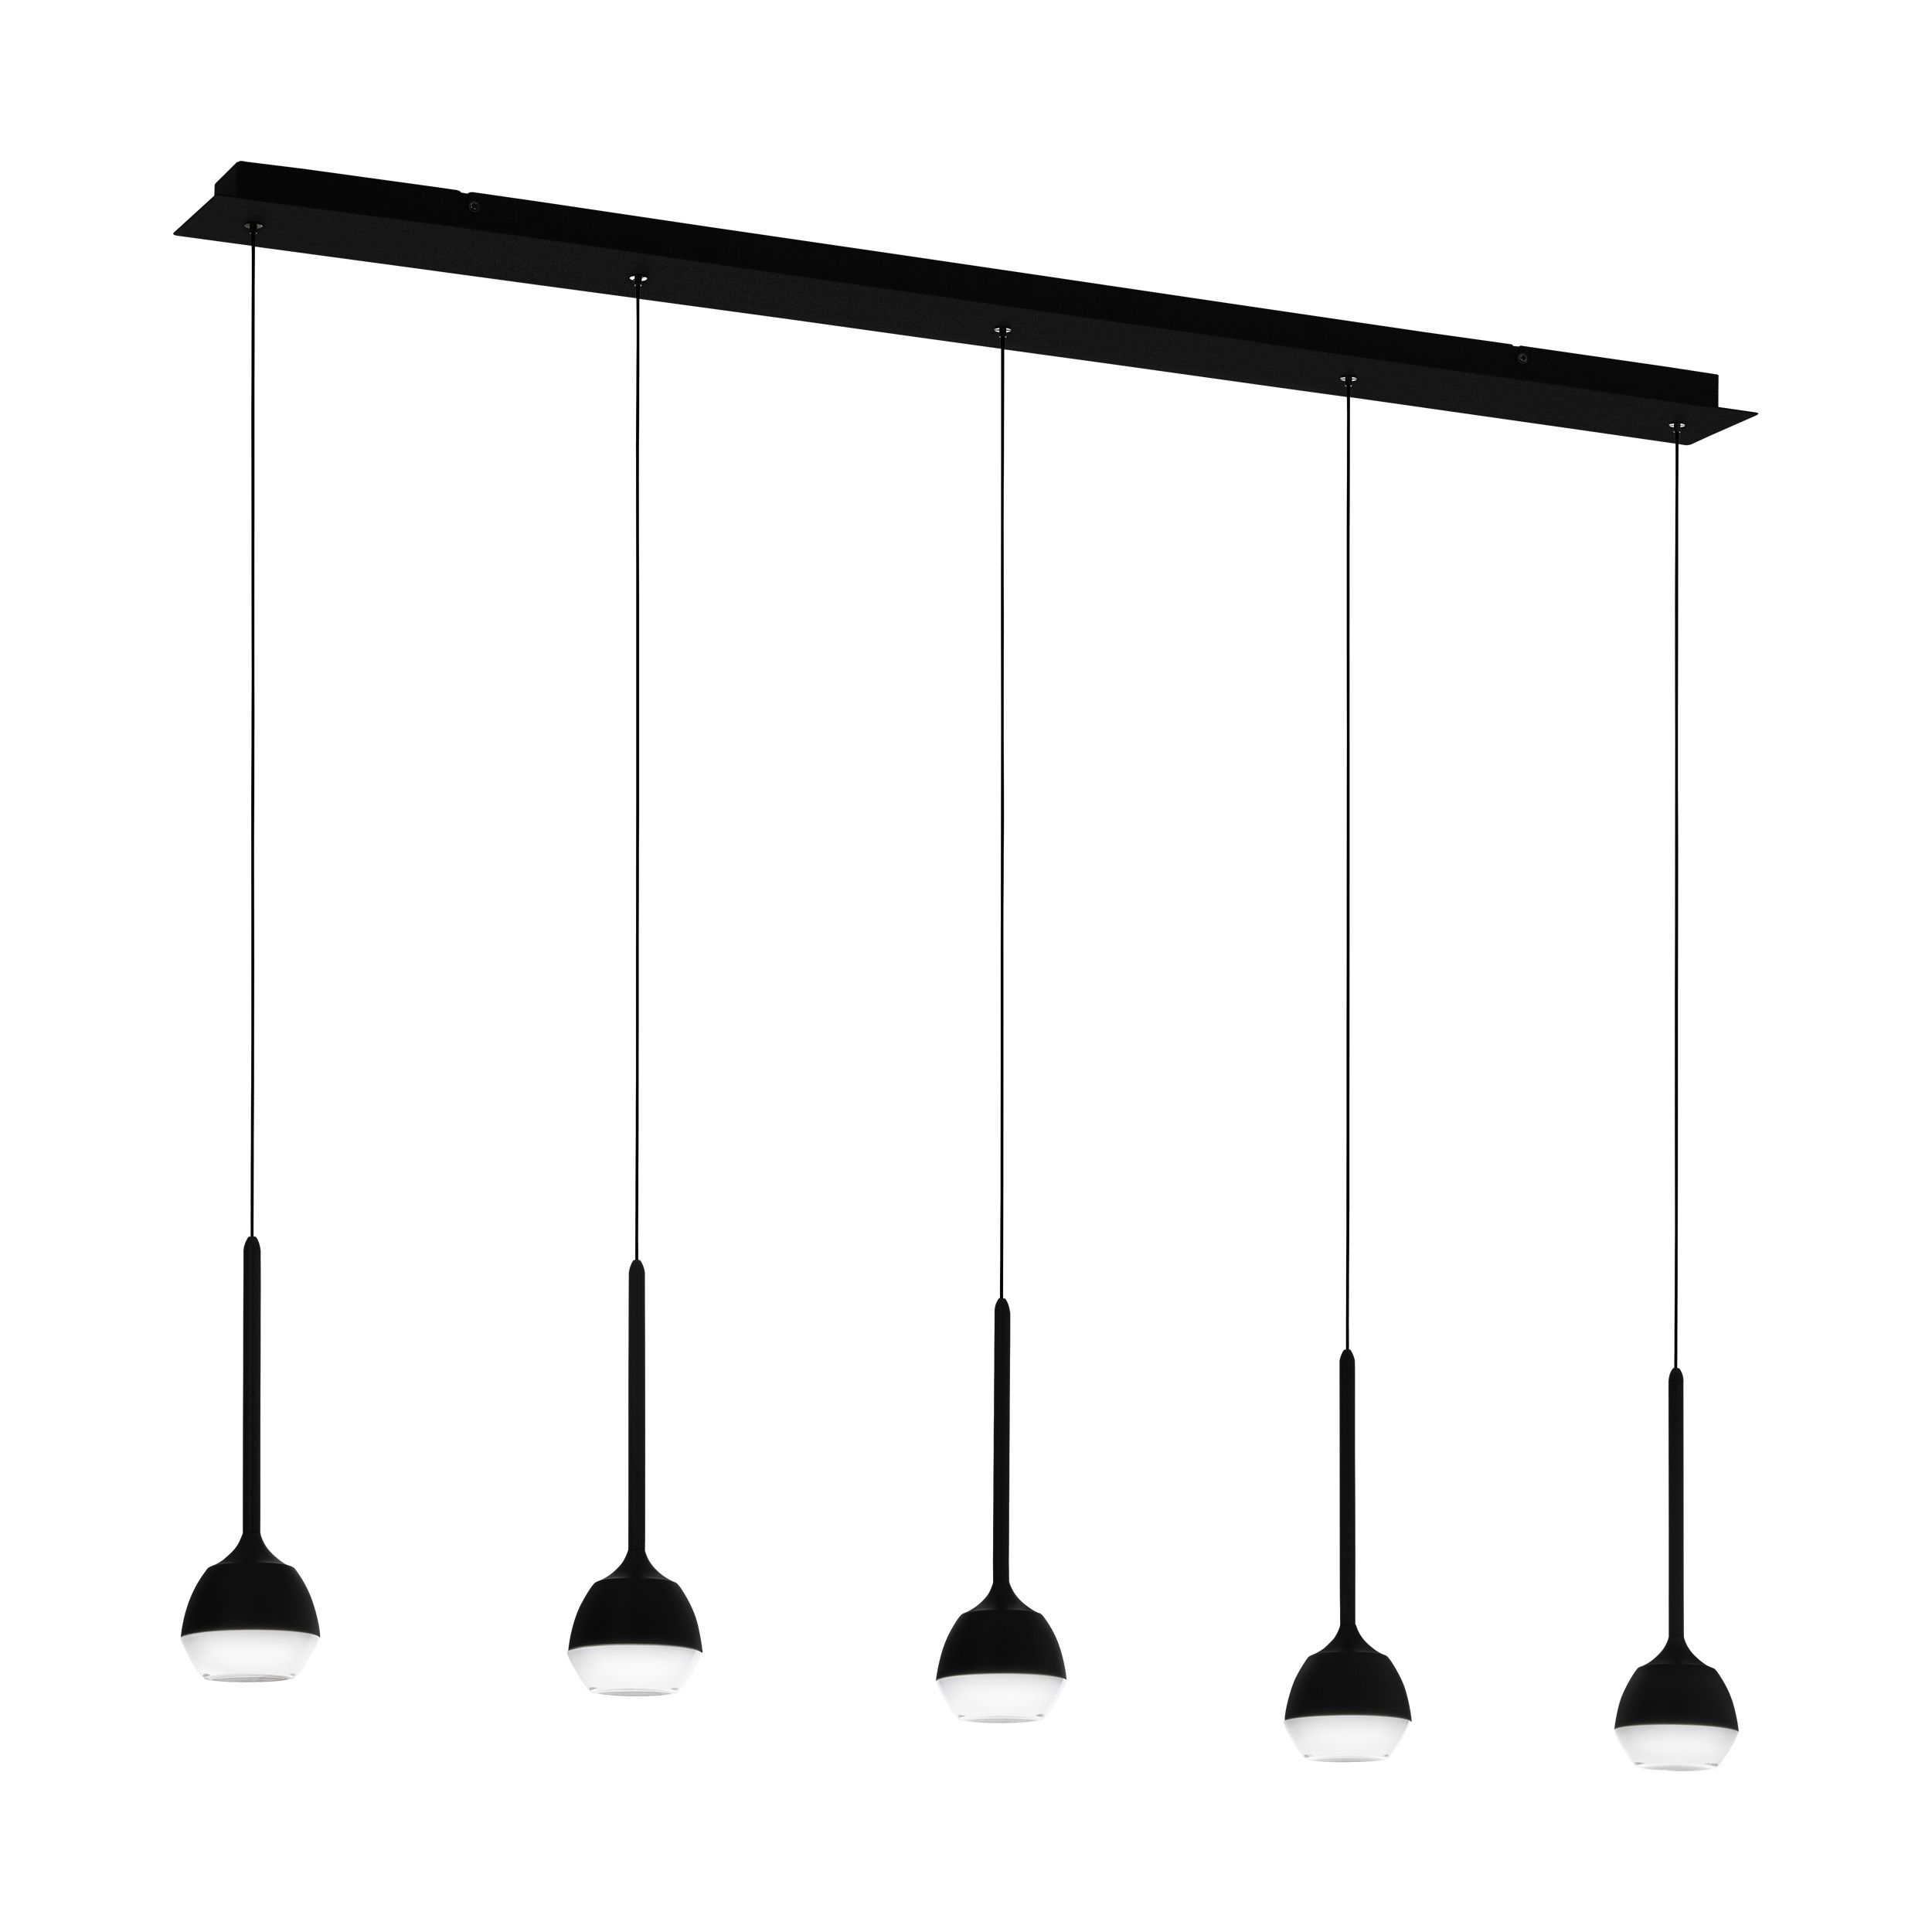 Rippvalgusti NUCETTO LED 5x4,5W 5x530lm hämardatav; metall, must